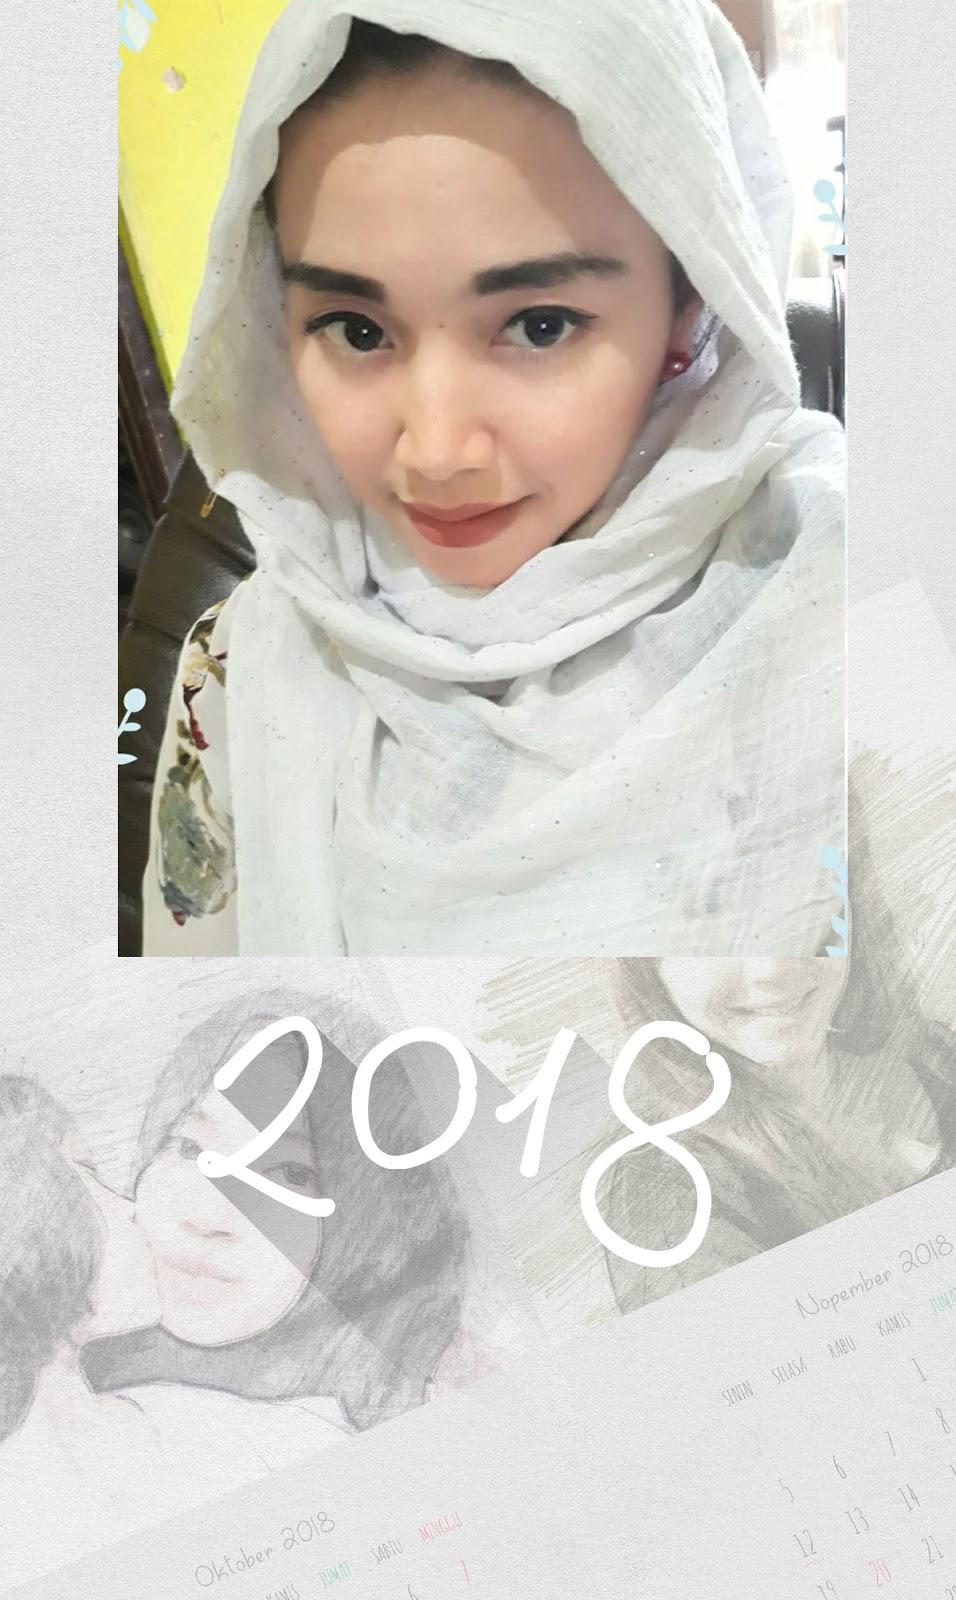 Desain Kalender Indonesia 2018 - Cover